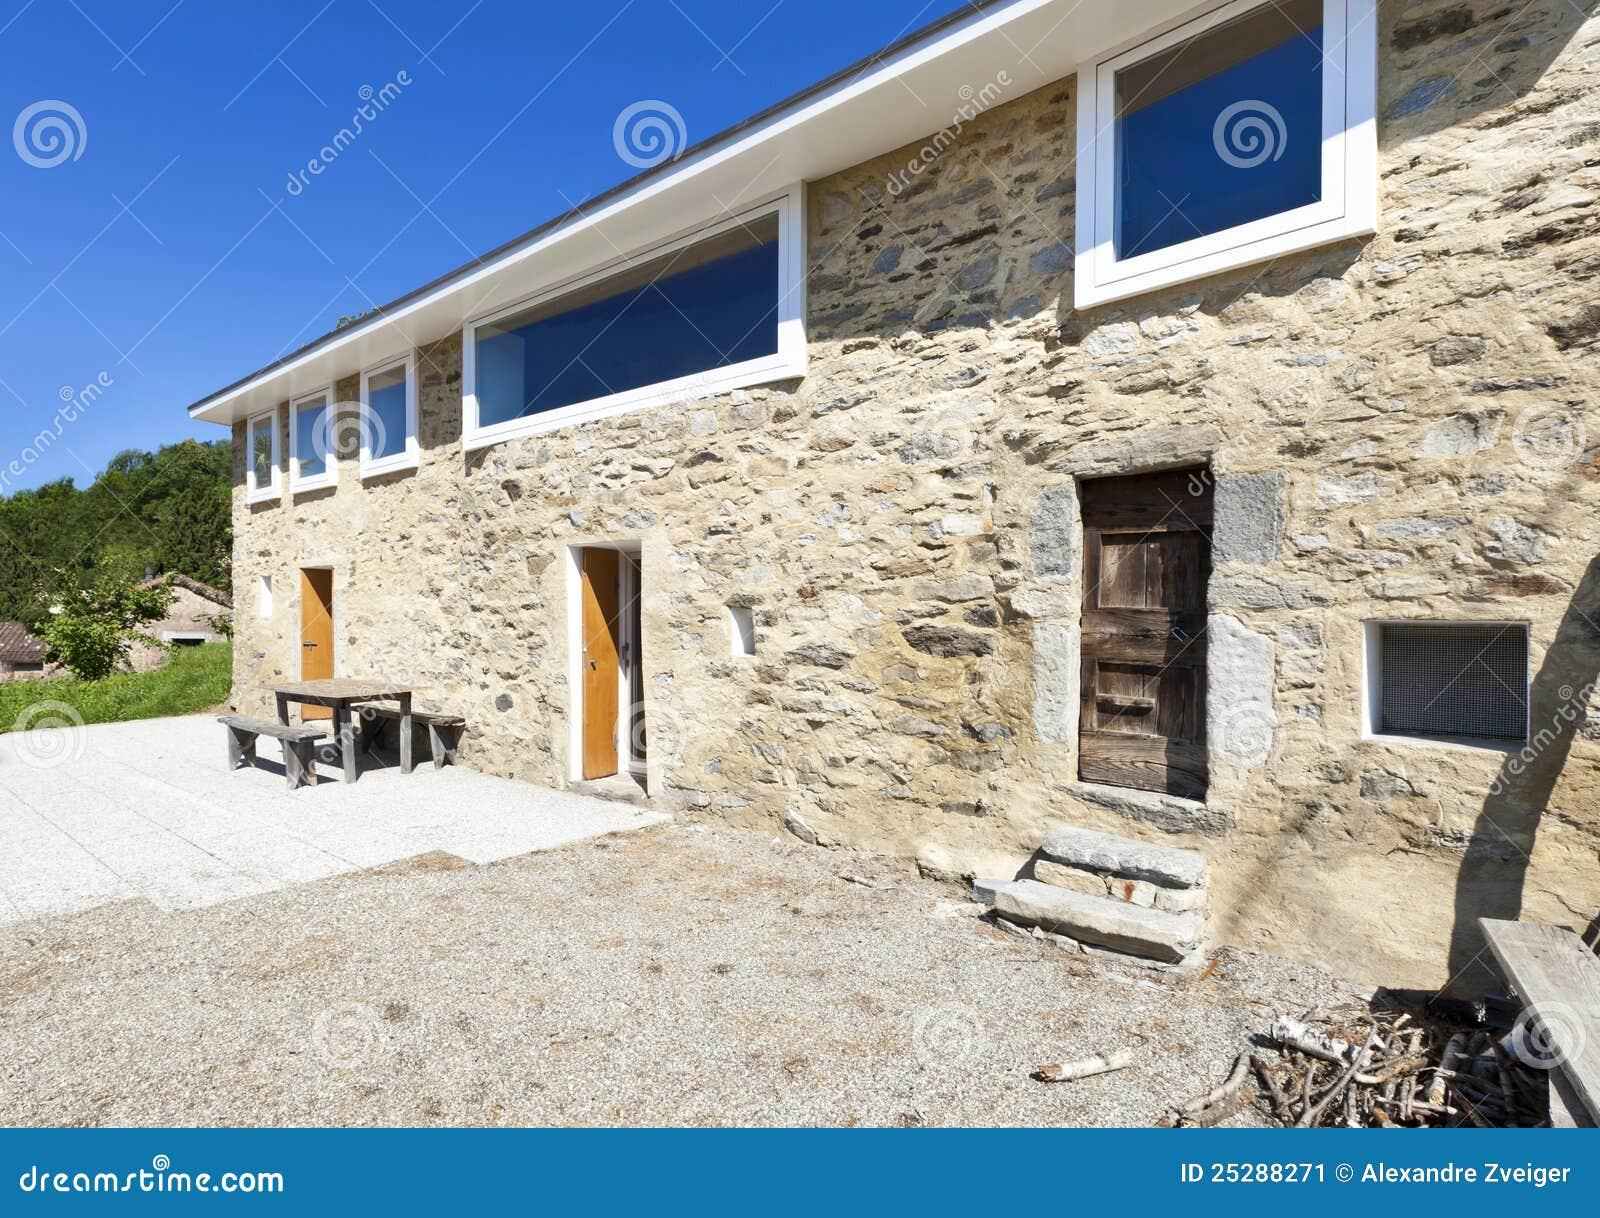 Casa rustica di festa immagine stock immagine 25288271 for Piani di casa vacanza rustica